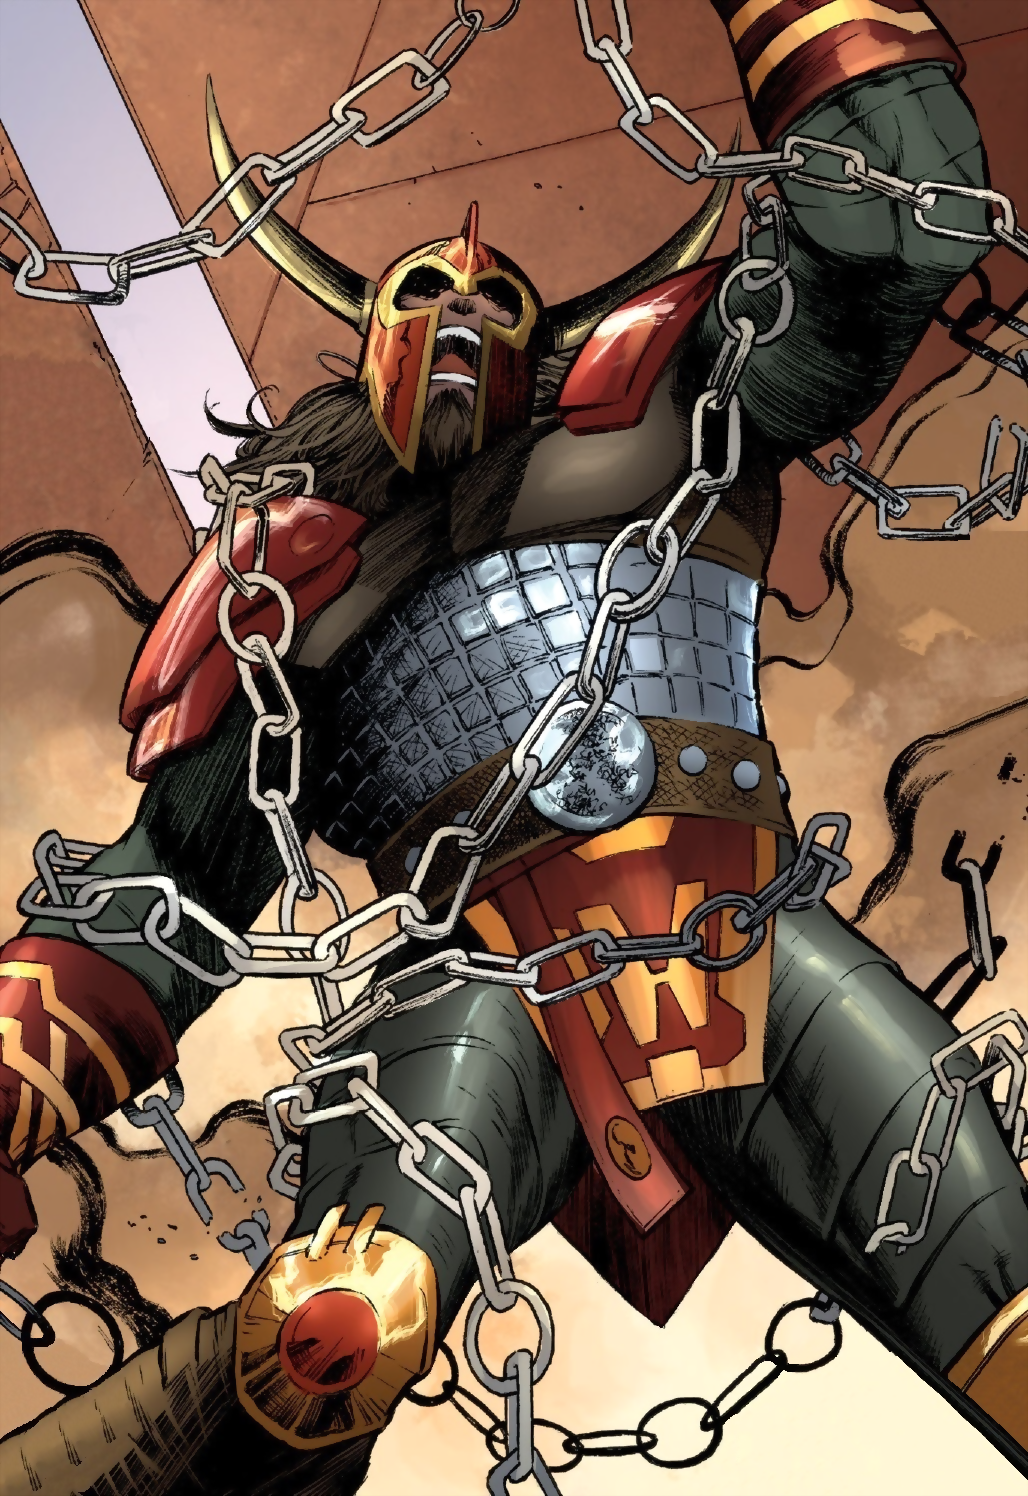 Heimdall (Comics) | Who's Who In Comic Book Movies Wikia | Fandom